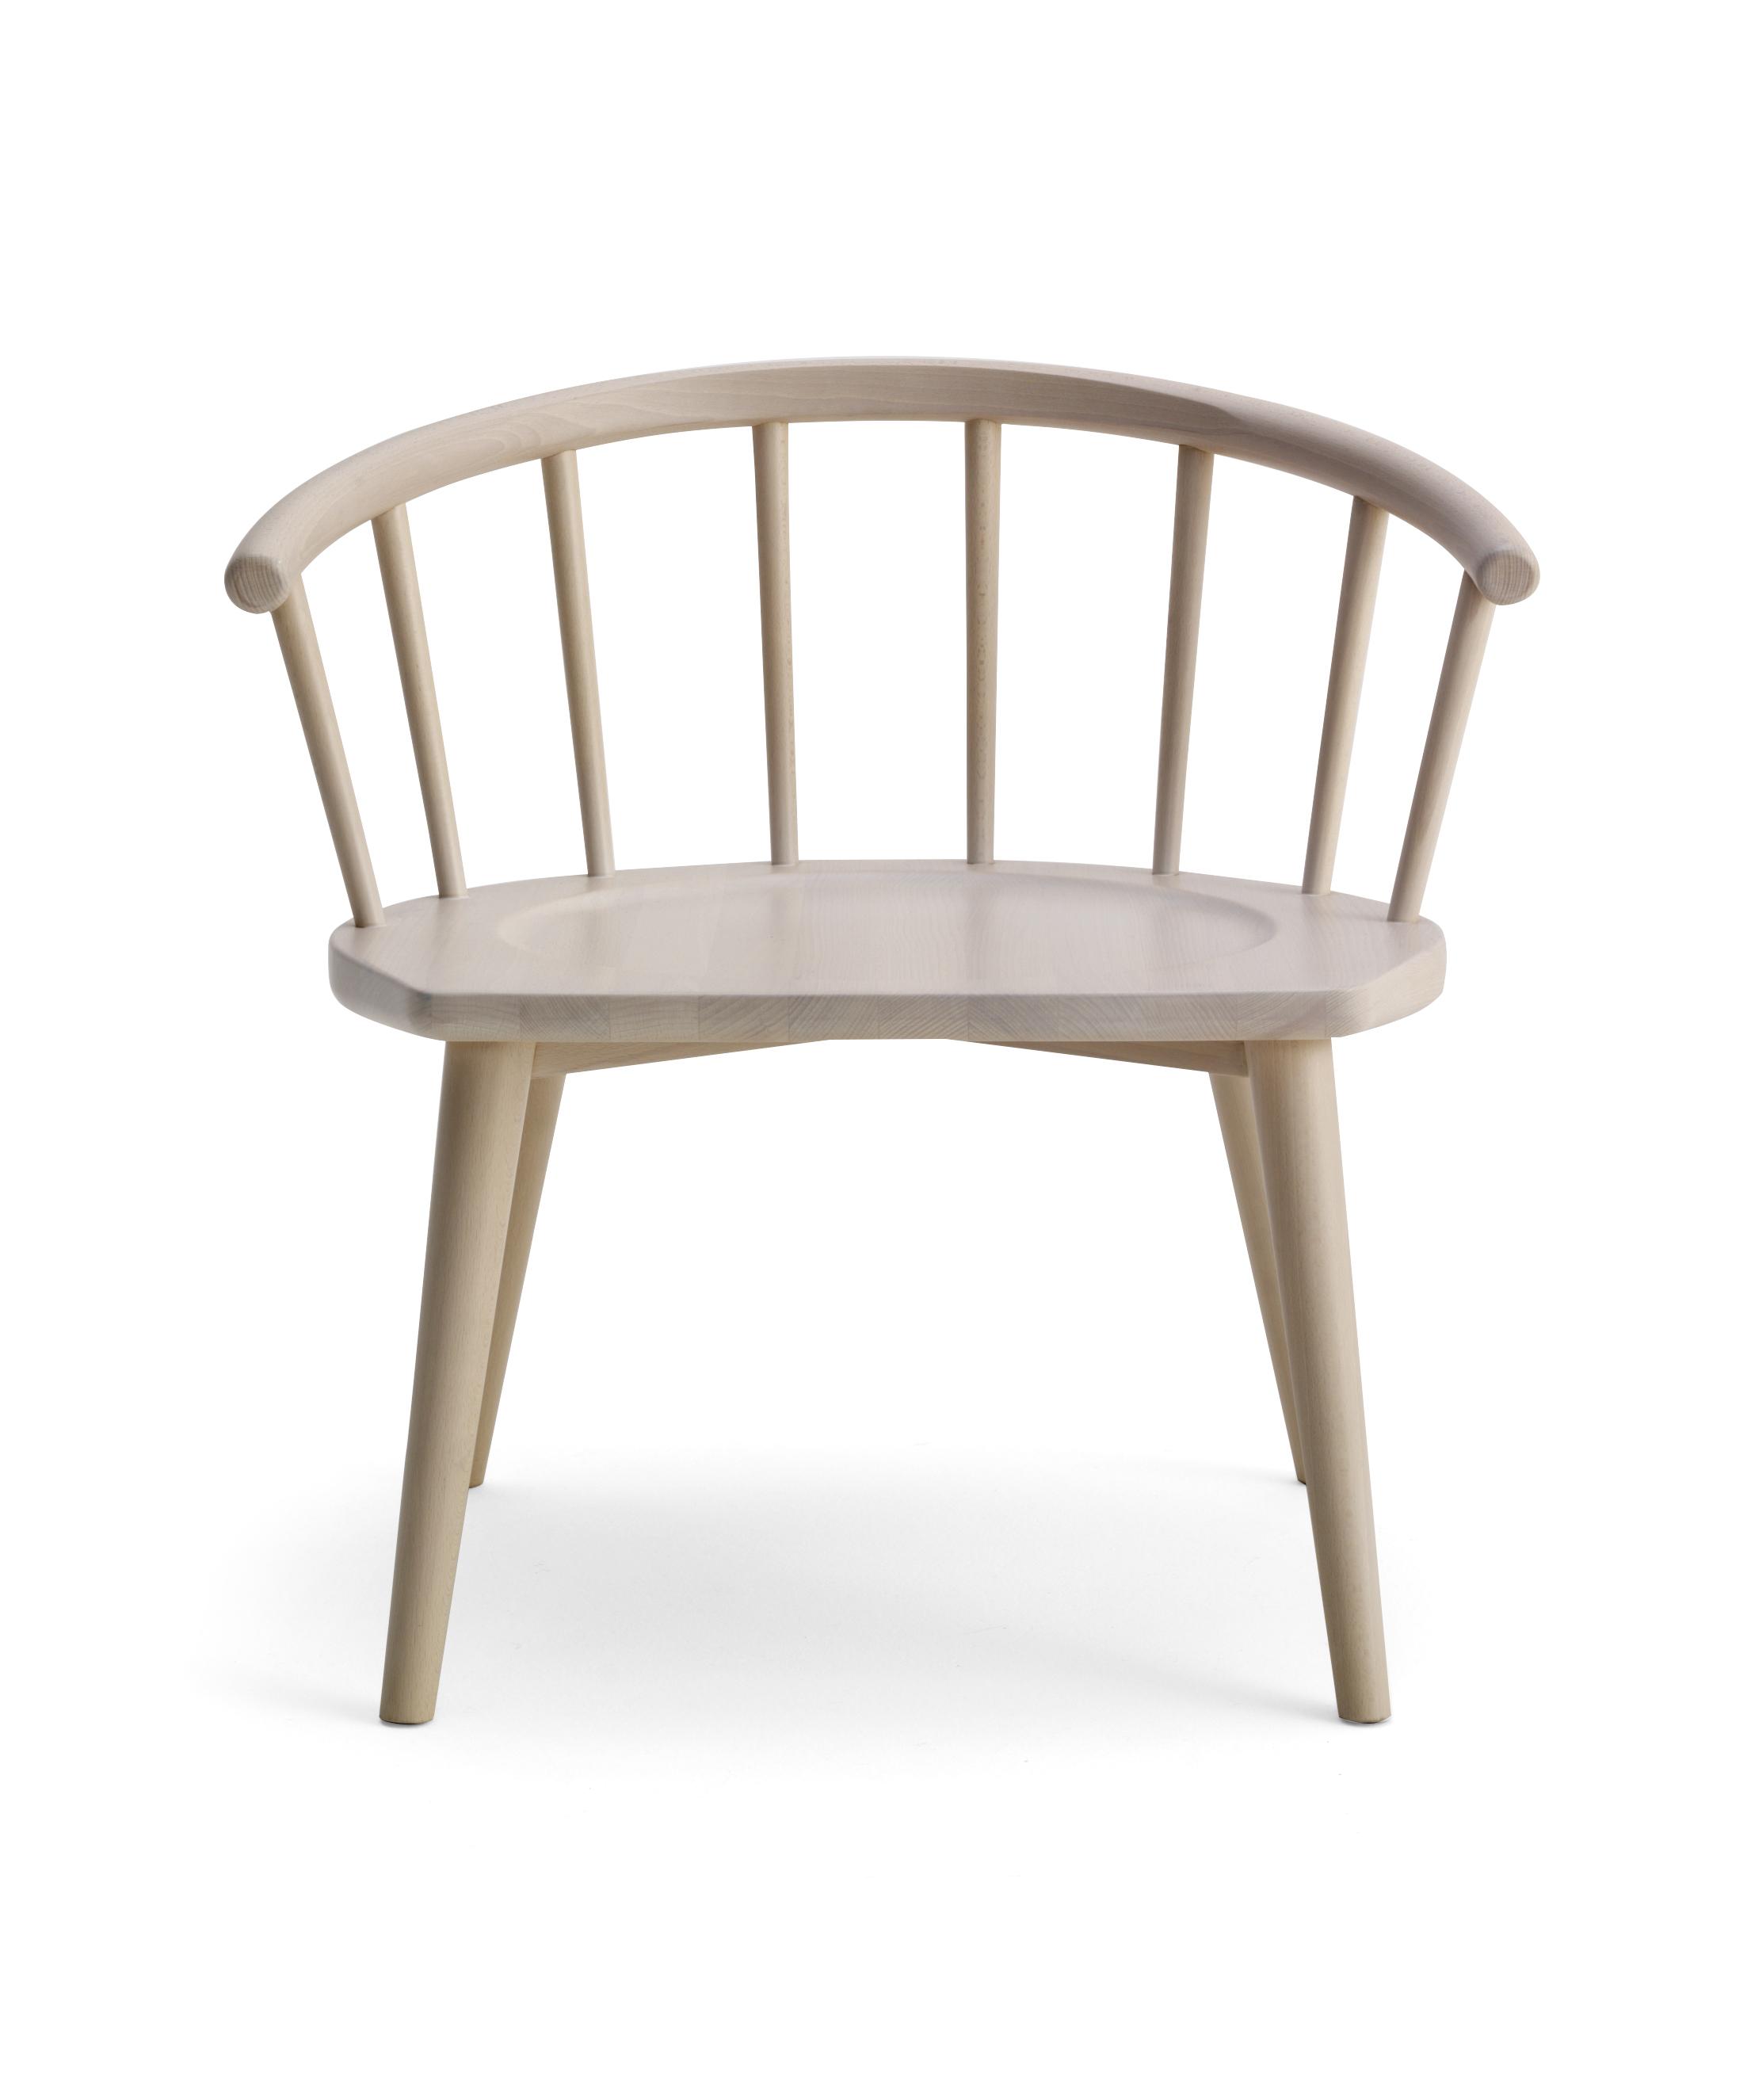 billiani-tracy lounge chair-Frabrizio Galinaro.jpg